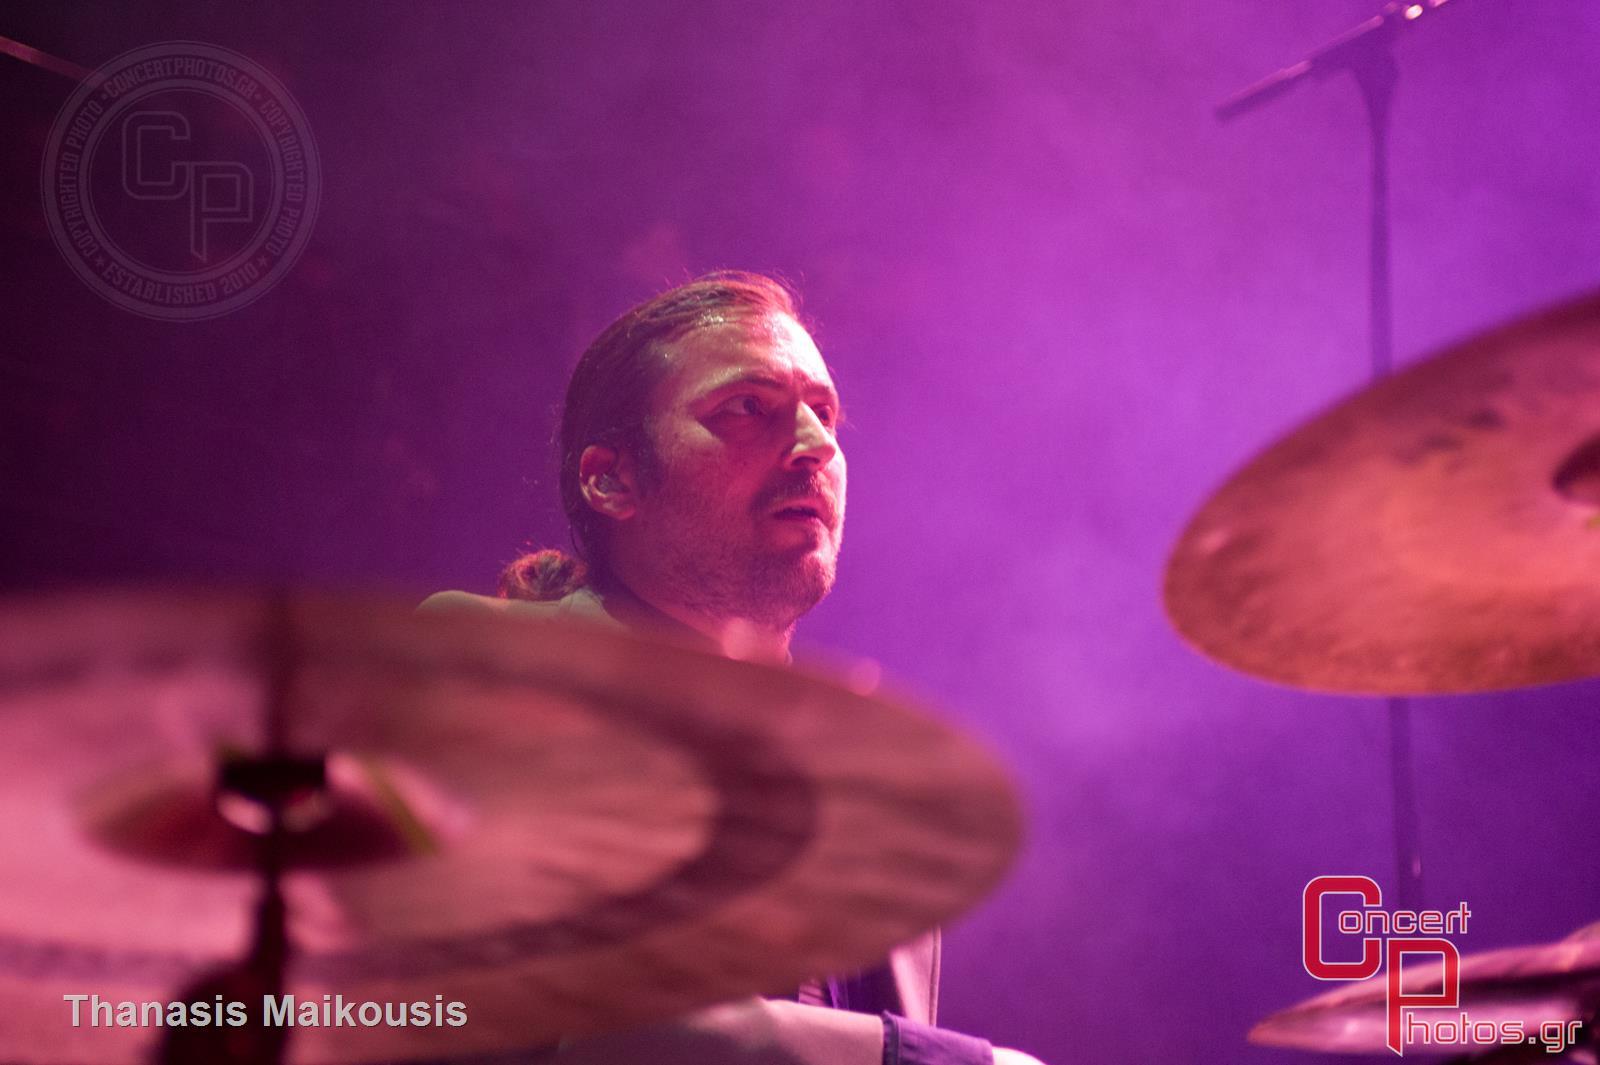 Tricky - Spectralfire-Tricky - Spectralfire photographer: Thanasis Maikousis - concertphotos_-3563